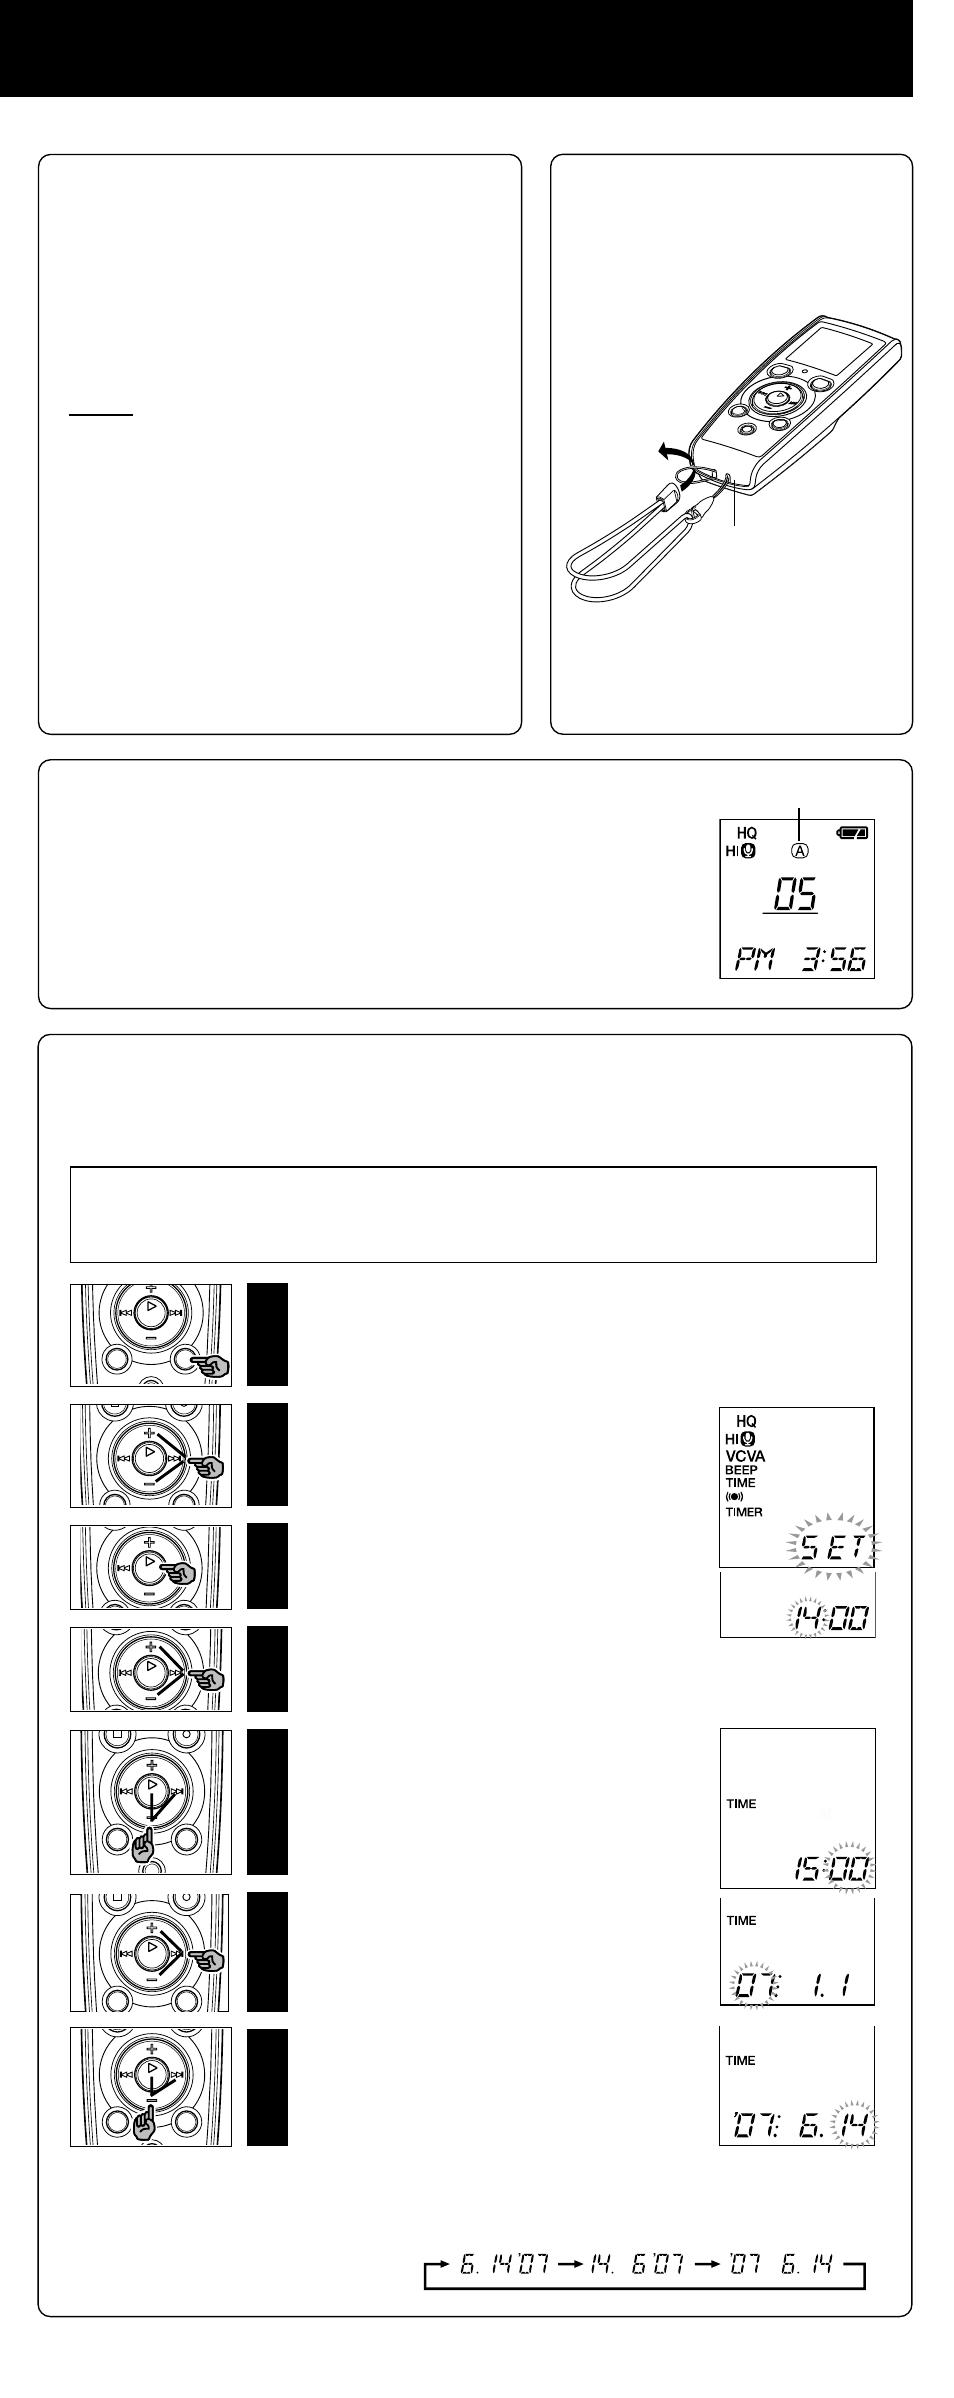 Digital Voice Recorder Vn 4100pc драйвер